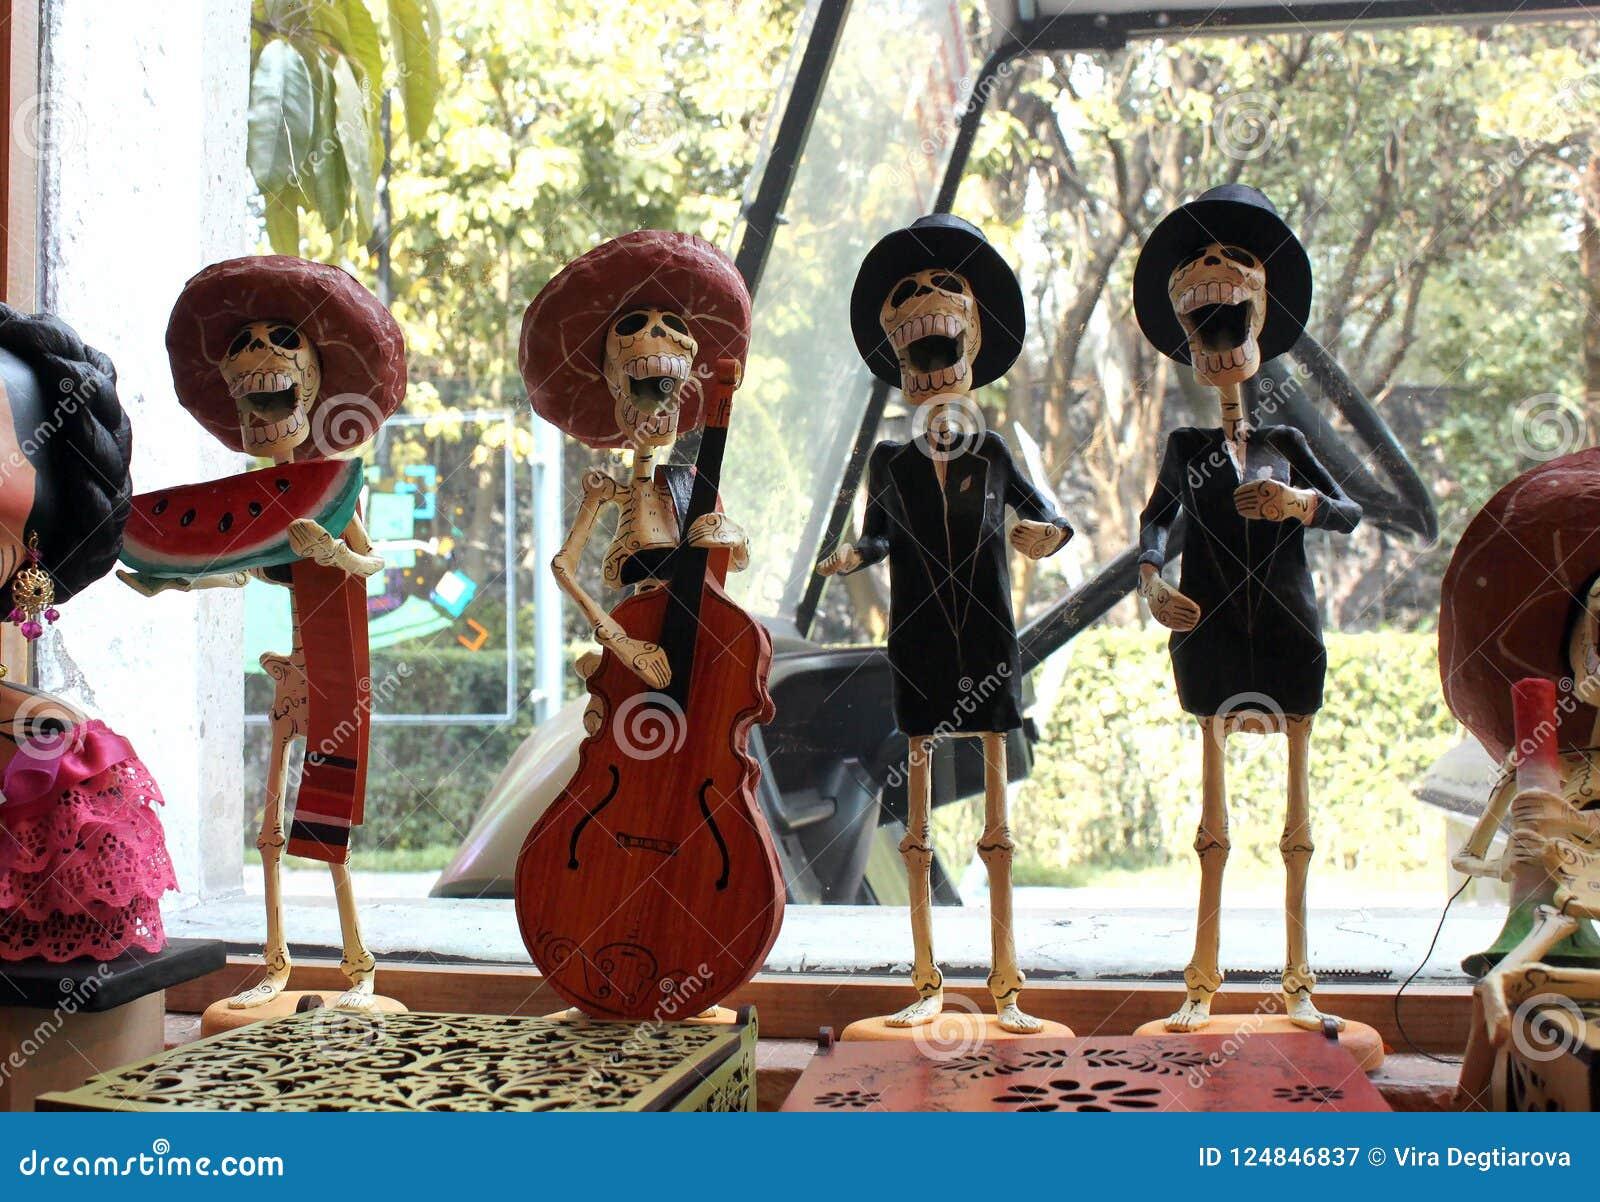 Mexikanische Zahl Skelettmusiker, Tag Dias de Los Muertos des Todes tot